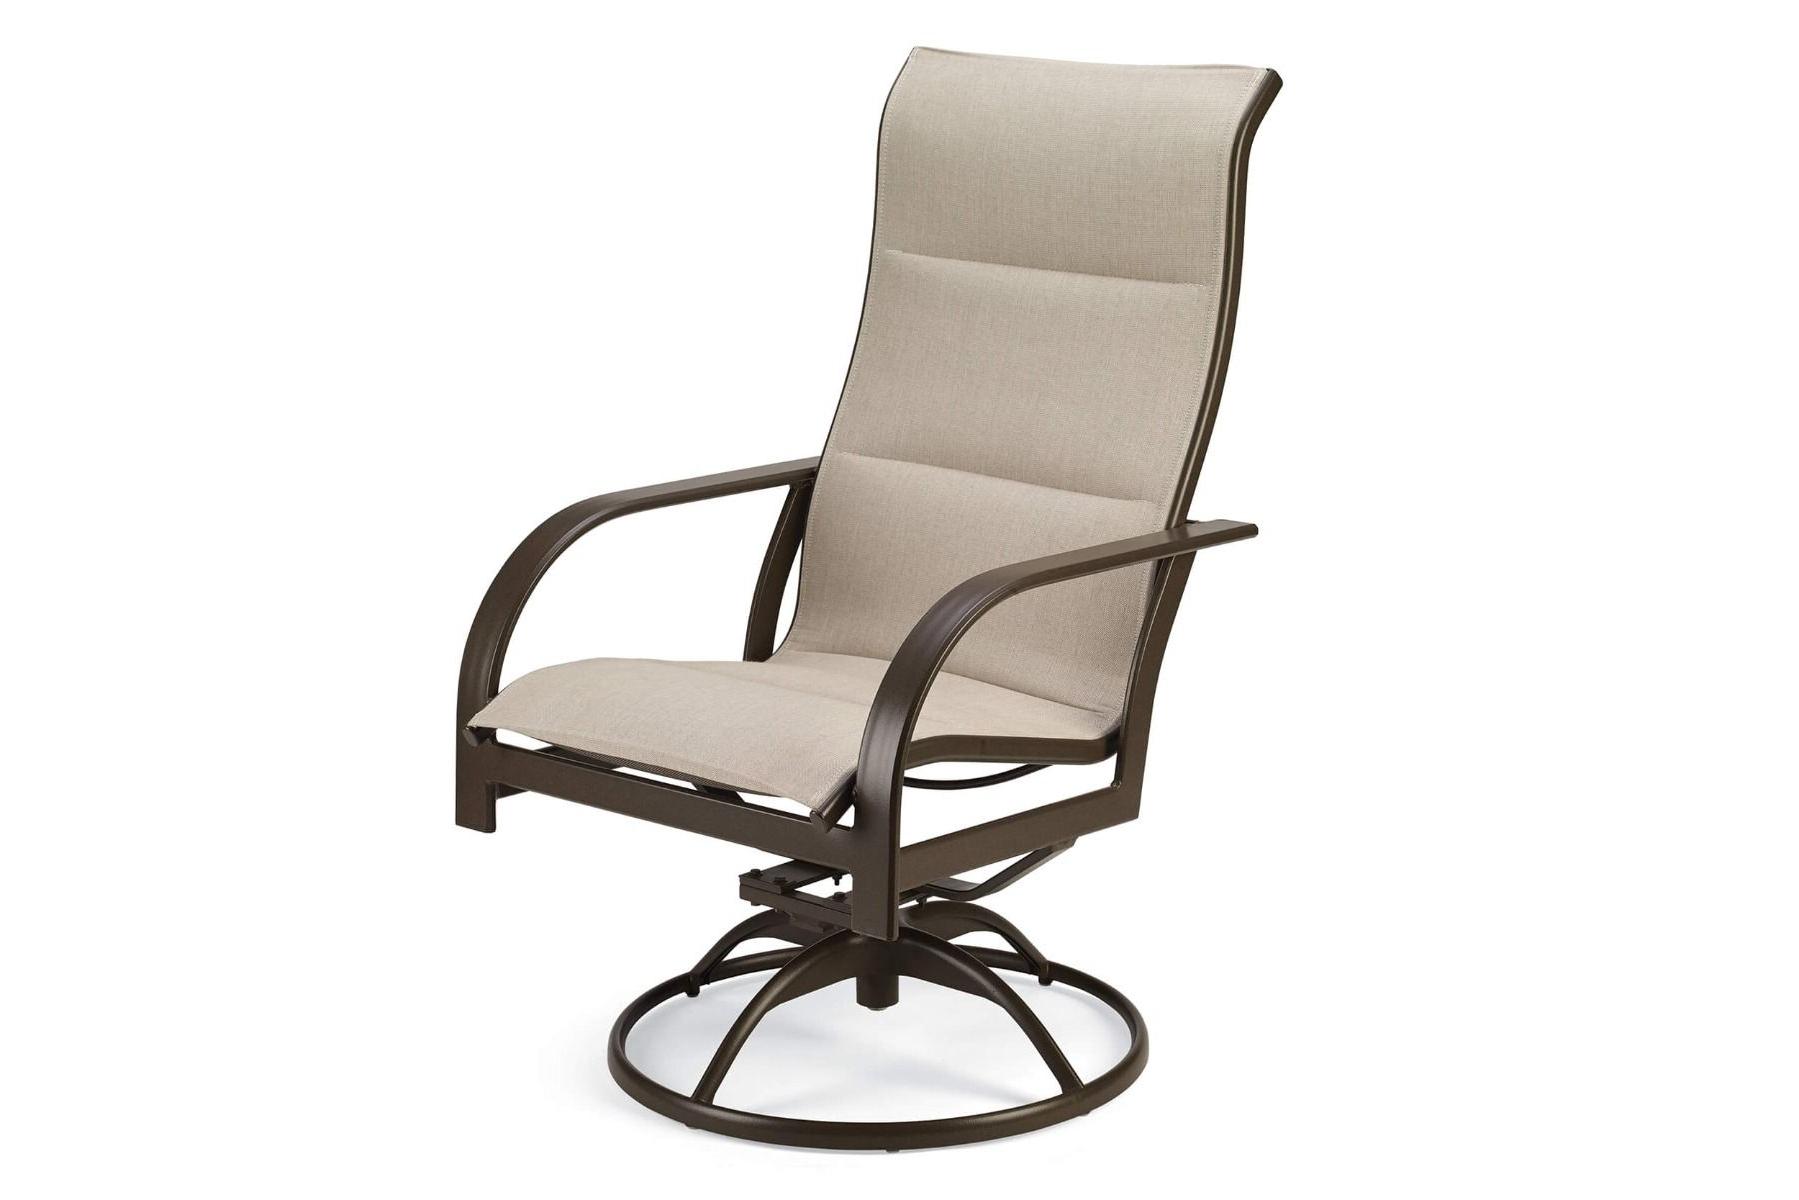 Key West Padded Sling Ultimate High Back Swivel Tilt Chair (2pk) Regarding Best And Newest Padded Sling High Back Swivel Chairs (View 3 of 30)